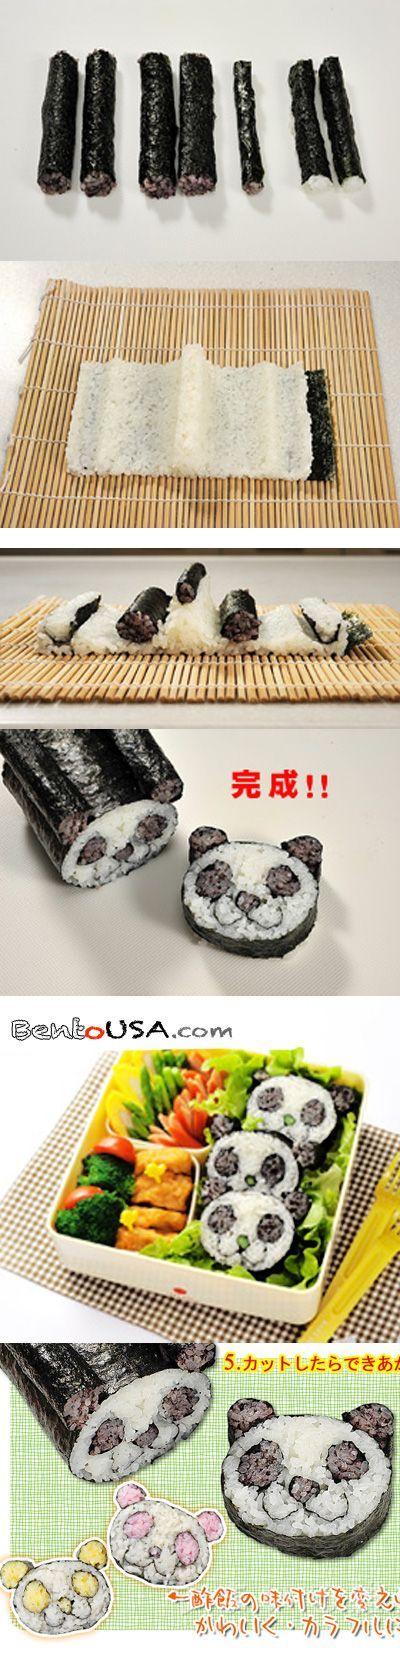 how to make panda sushi maki roll View The Recipe Details